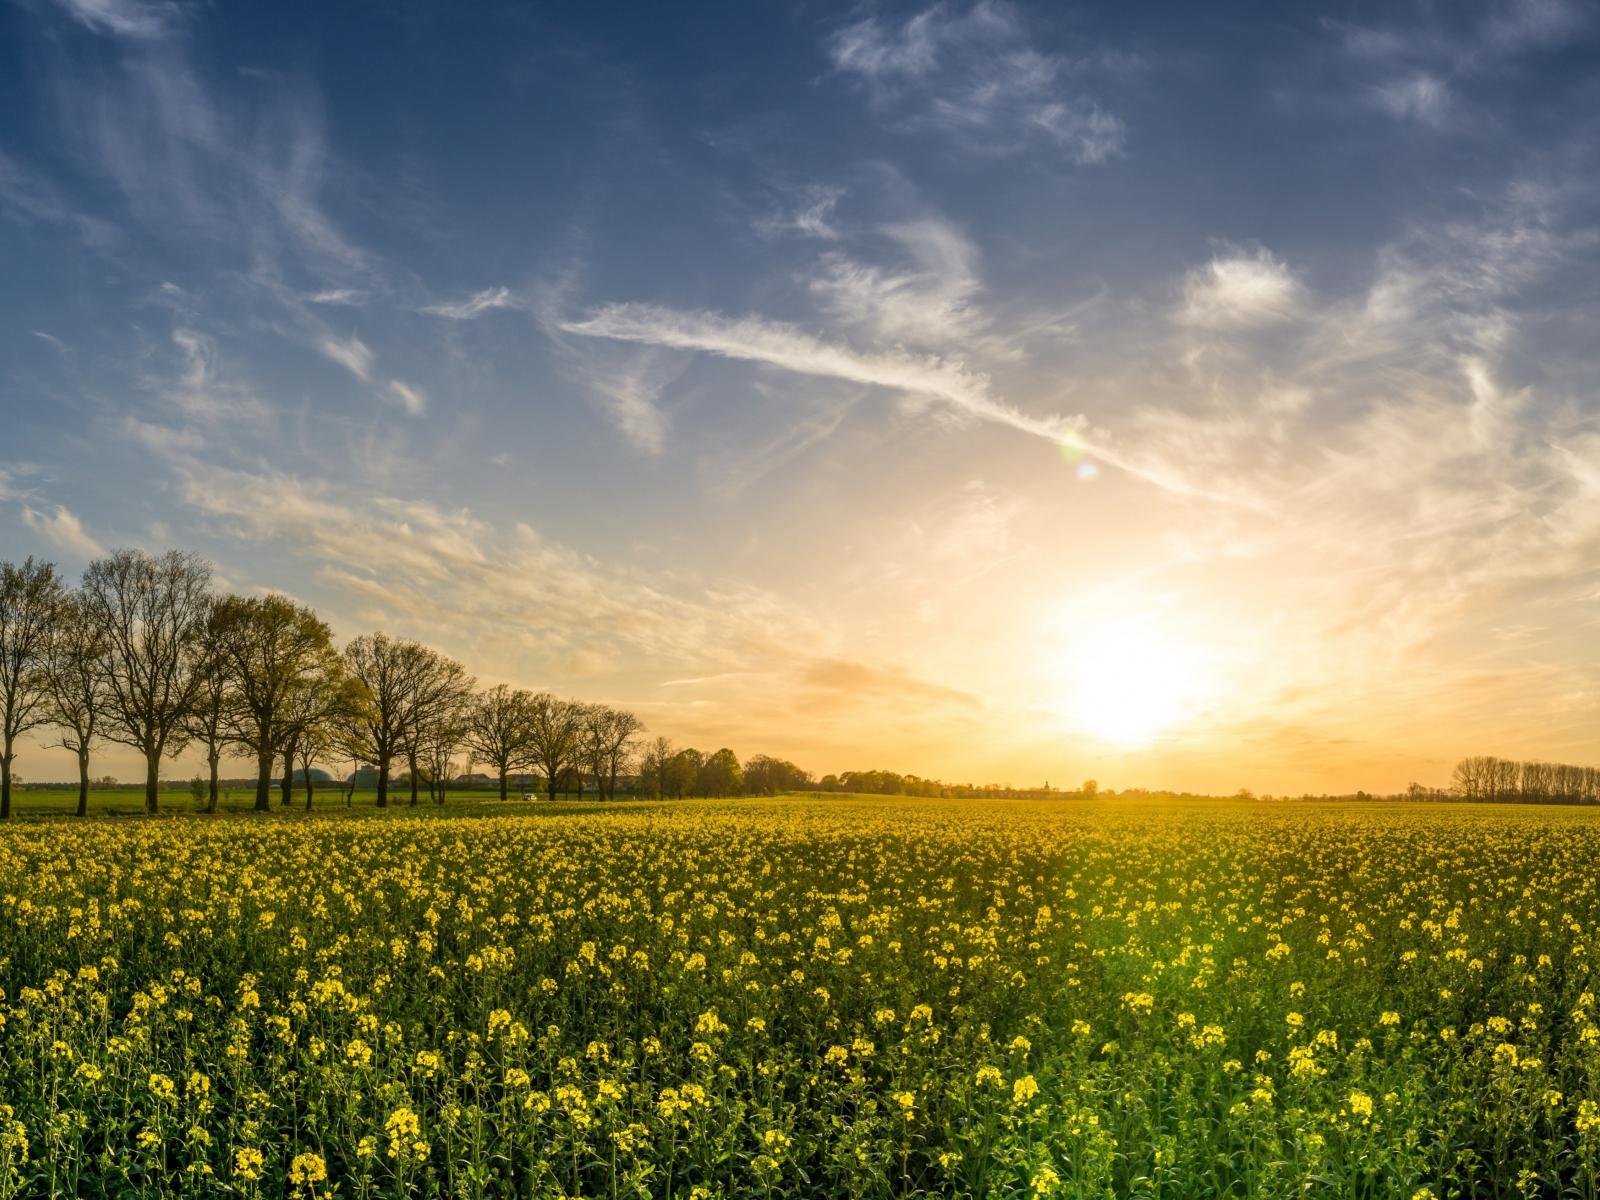 Oilseed rape, farm, sunny day, sky, 5k, 1600x1200 wallpaper